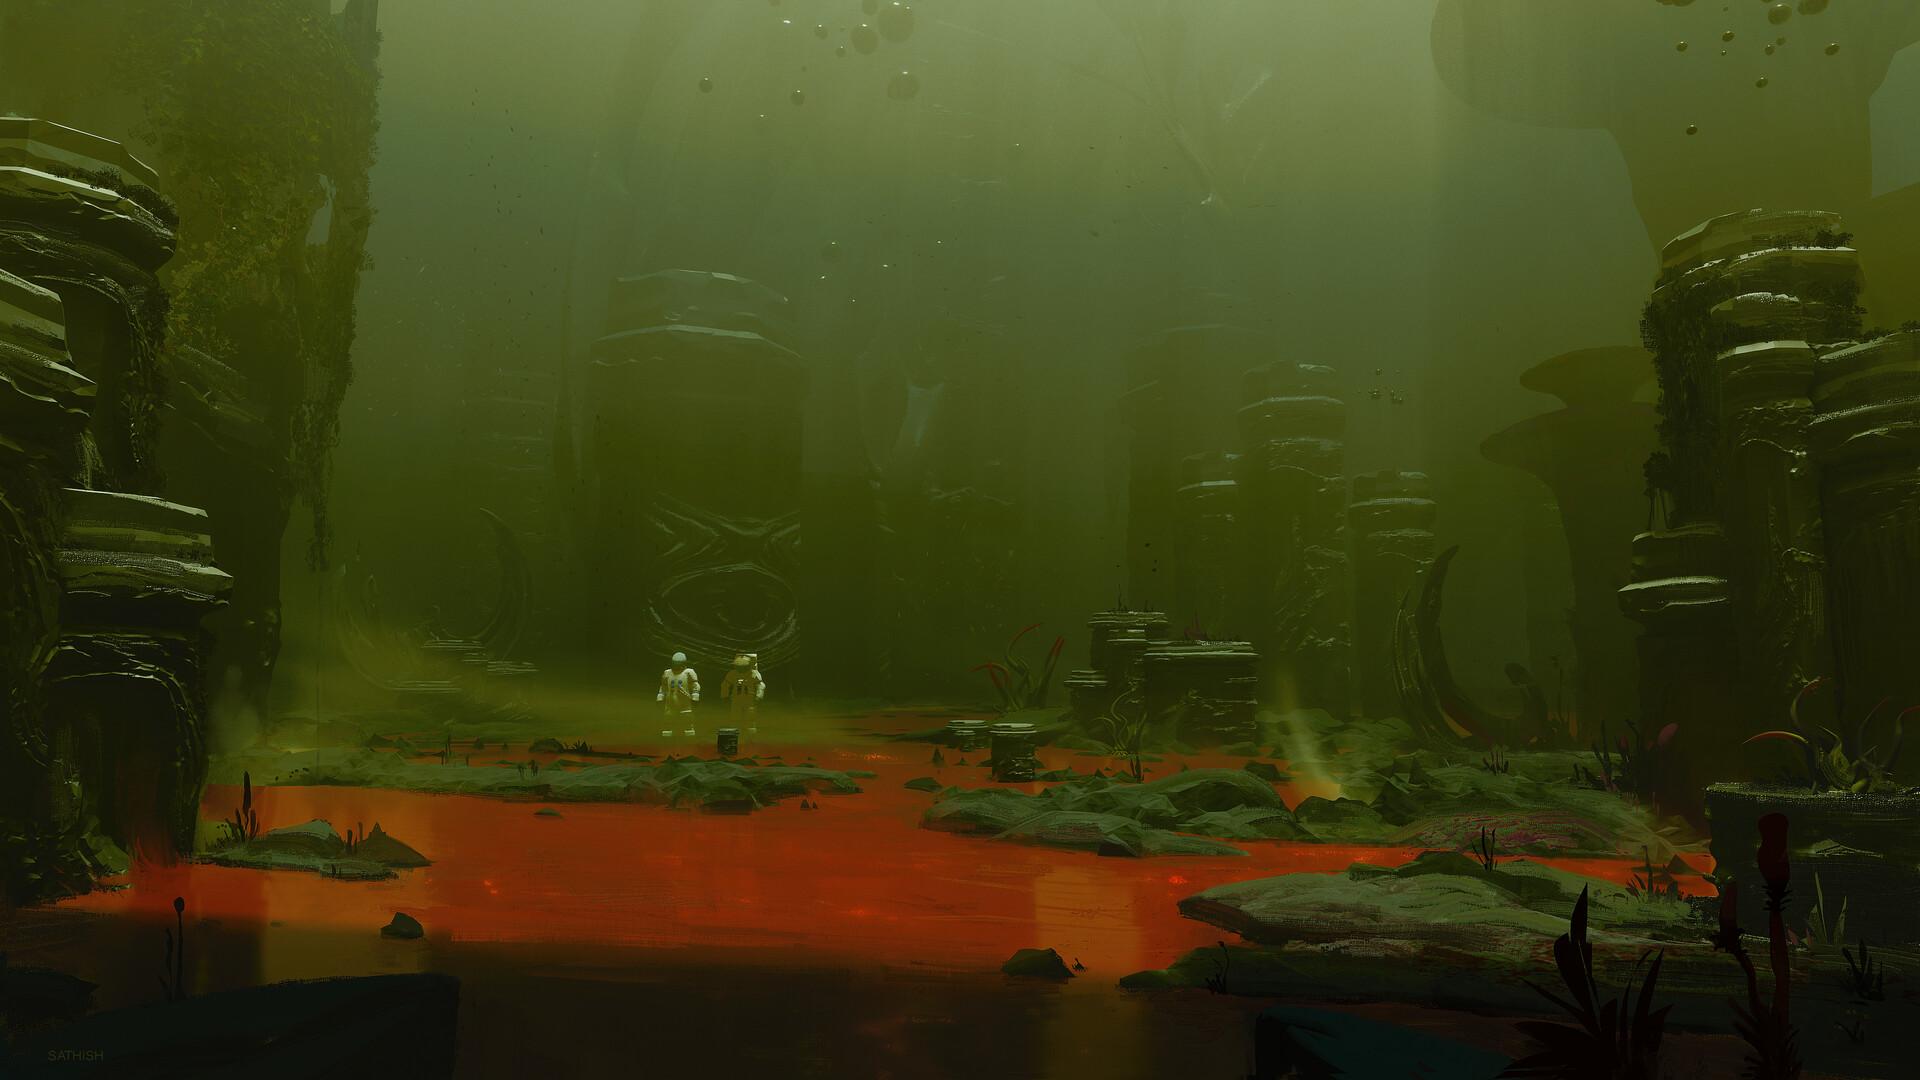 Sathish kumar alienworld exploration 01